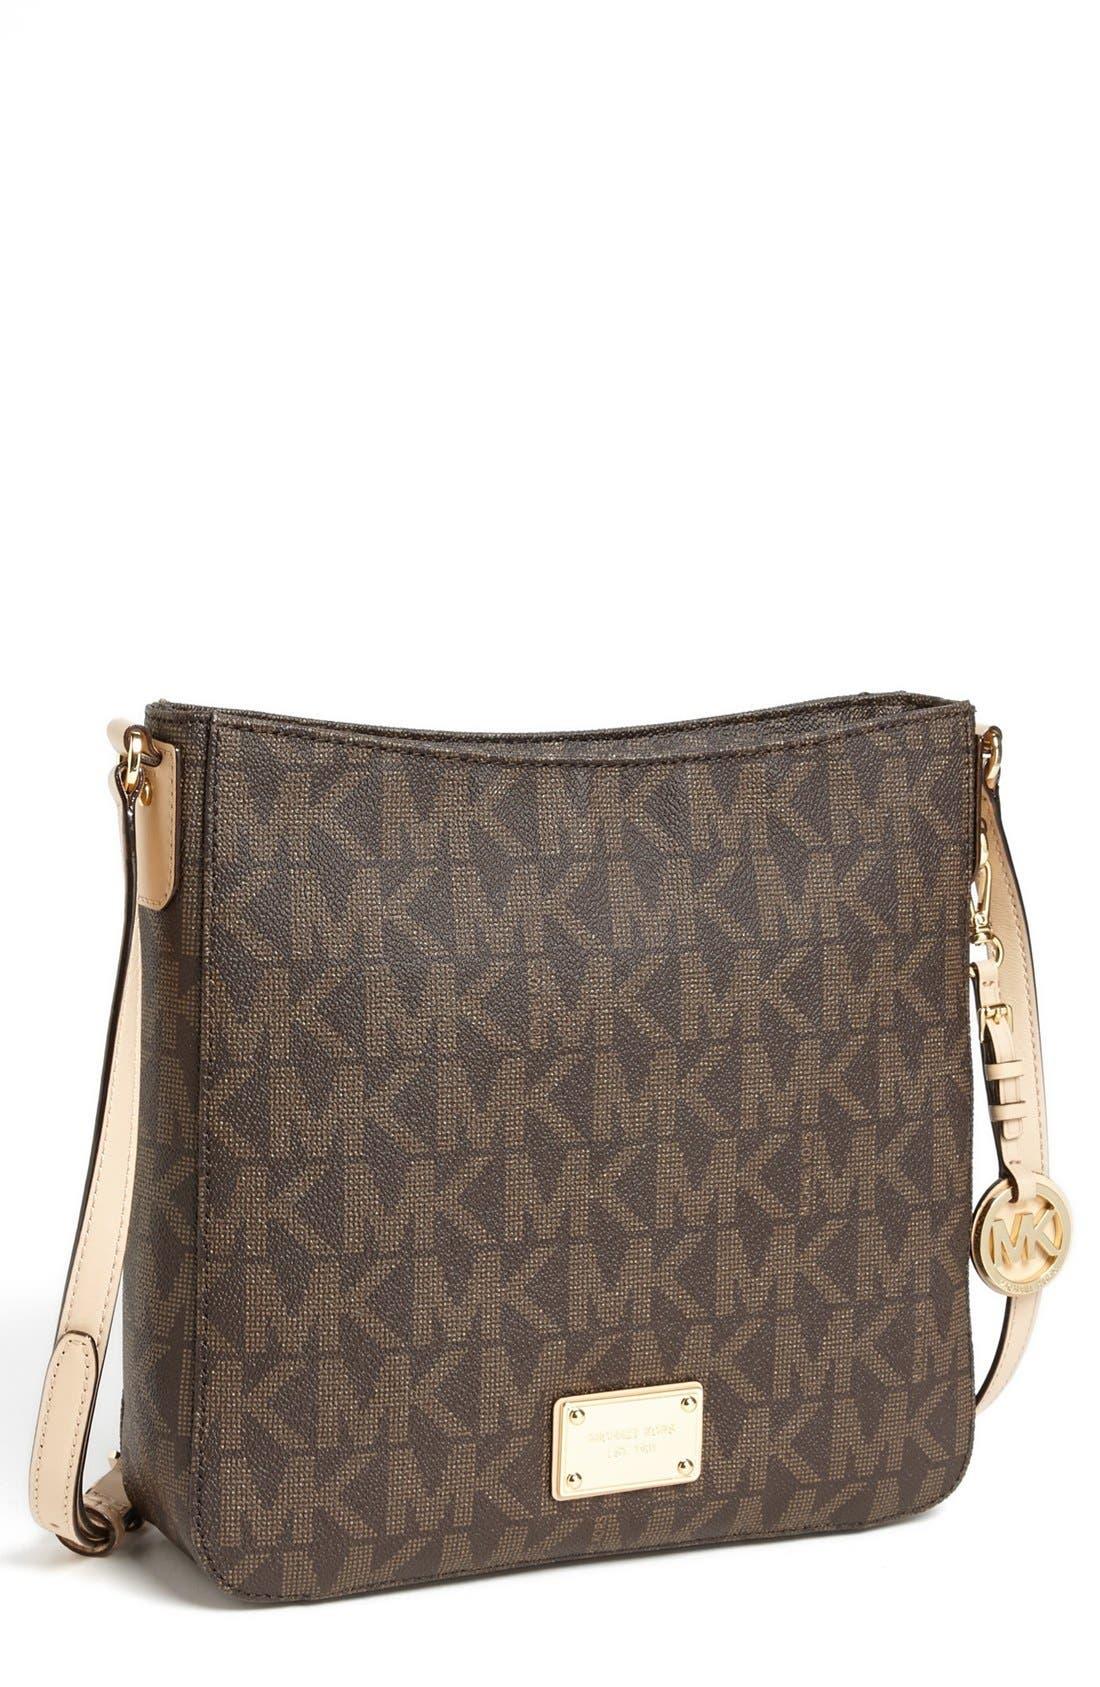 Alternate Image 1 Selected - MICHAEL Michael Kors 'Jet Set Signature - Large' Messenger Bag